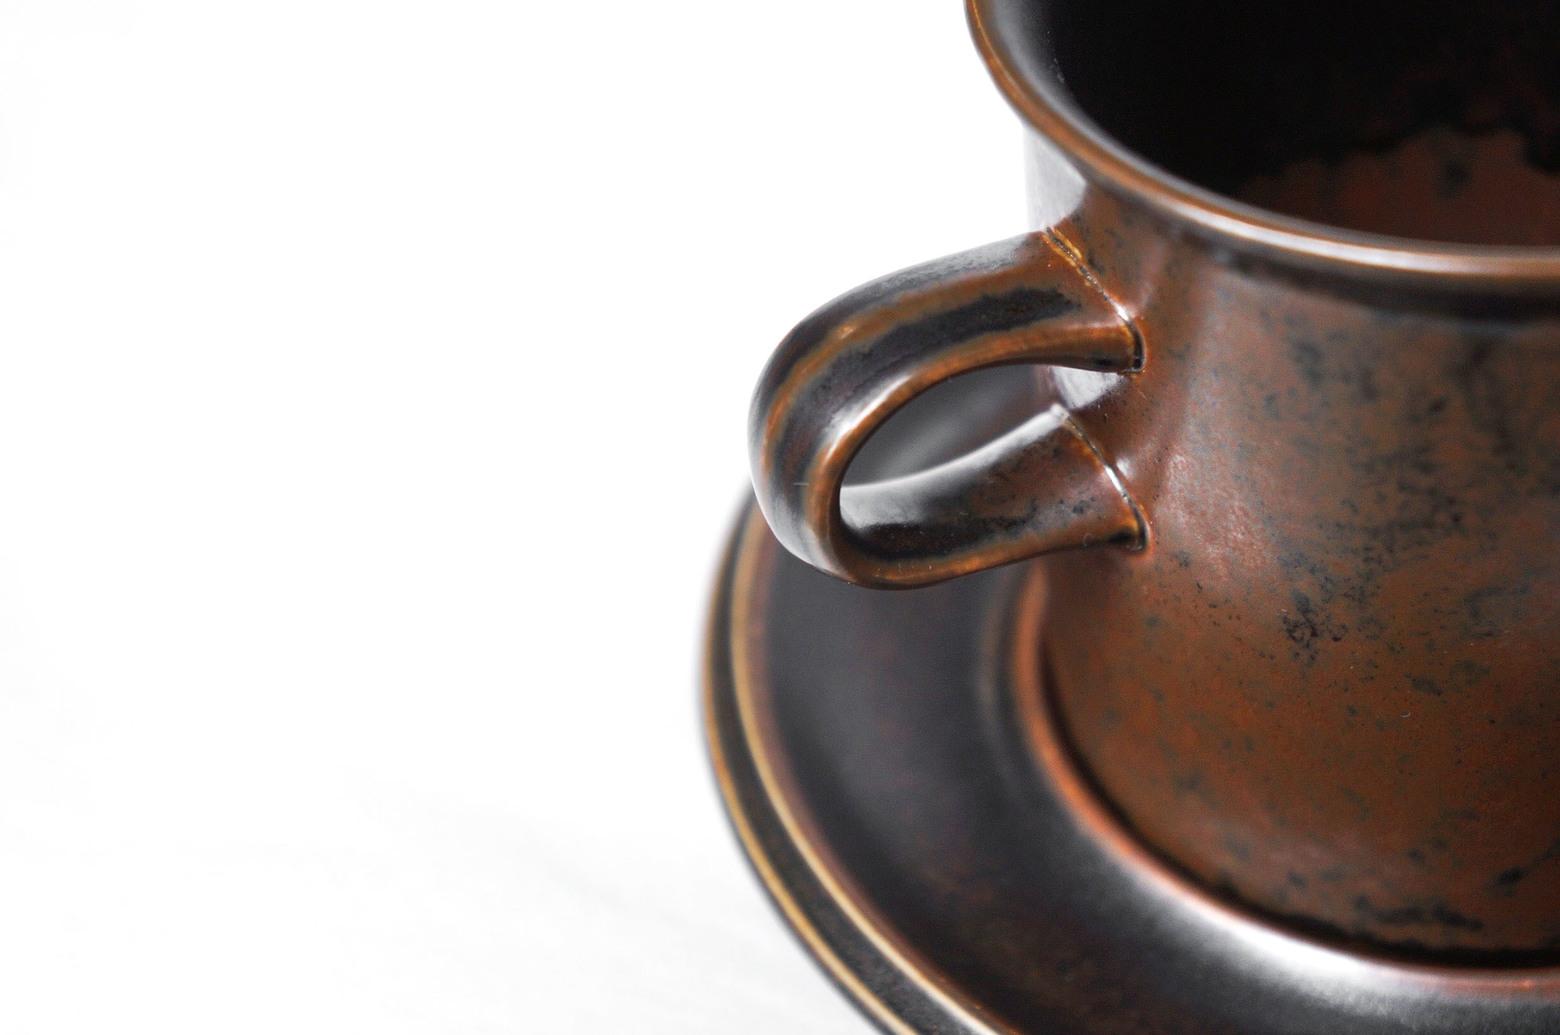 ARABIA Ruska Morning Cup and Saucer Ulla Procope/アラビア ルスカ モーニングカップ&ソーサー ウラ・プロコッペ フィンランド ヴィンテージ 北欧食器 1